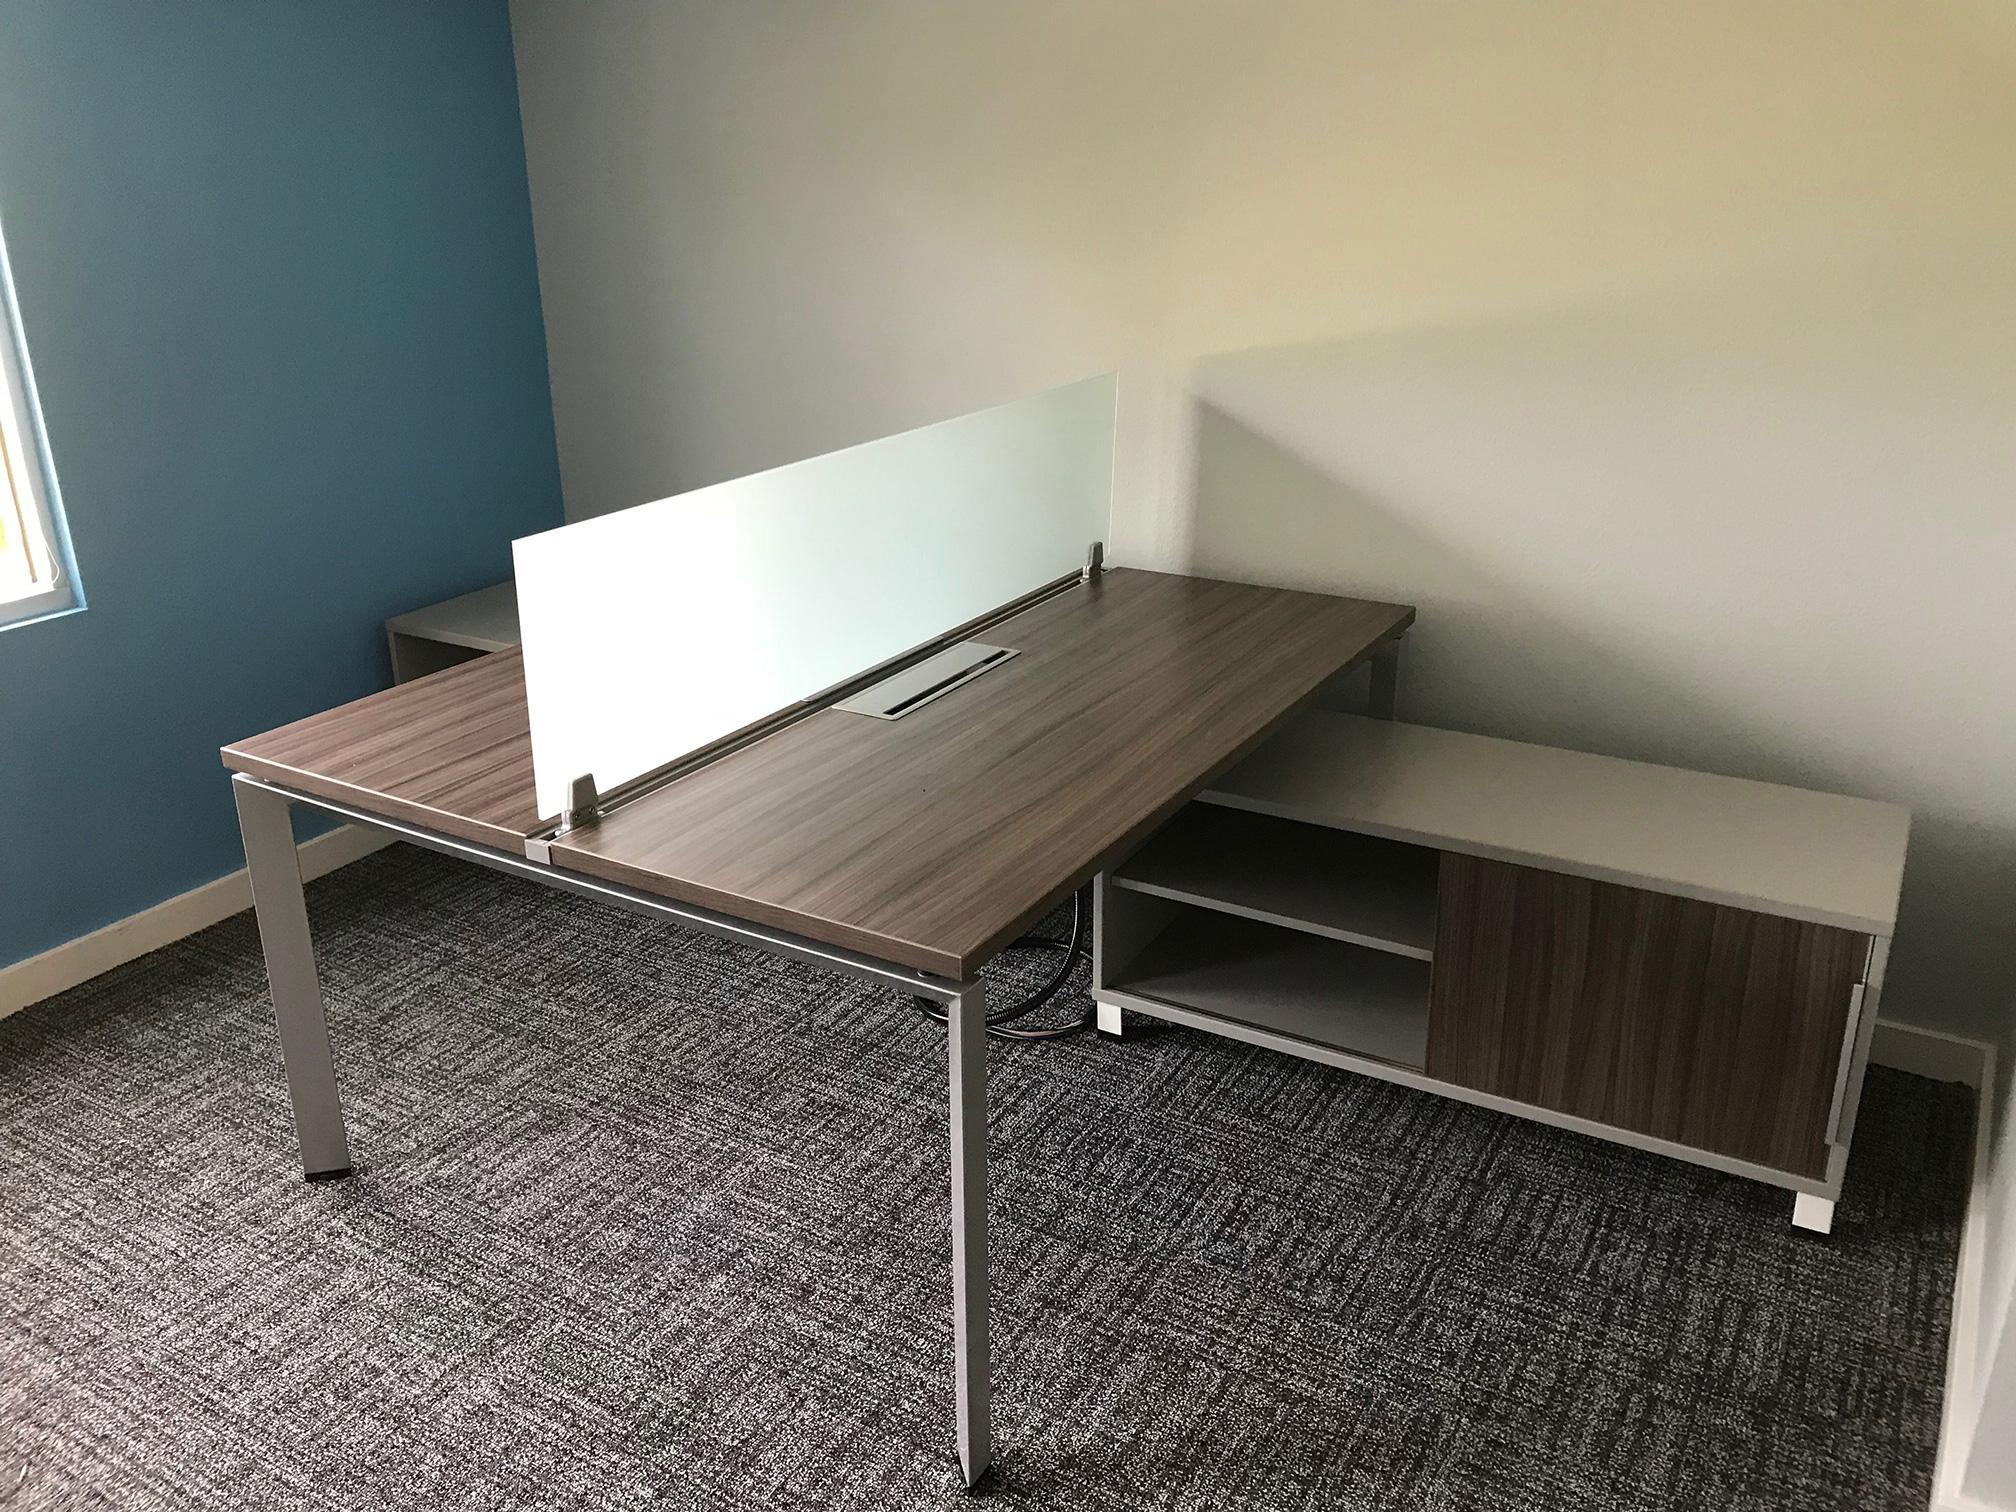 furniture-cubicles-in-naples-florida-6.jpg